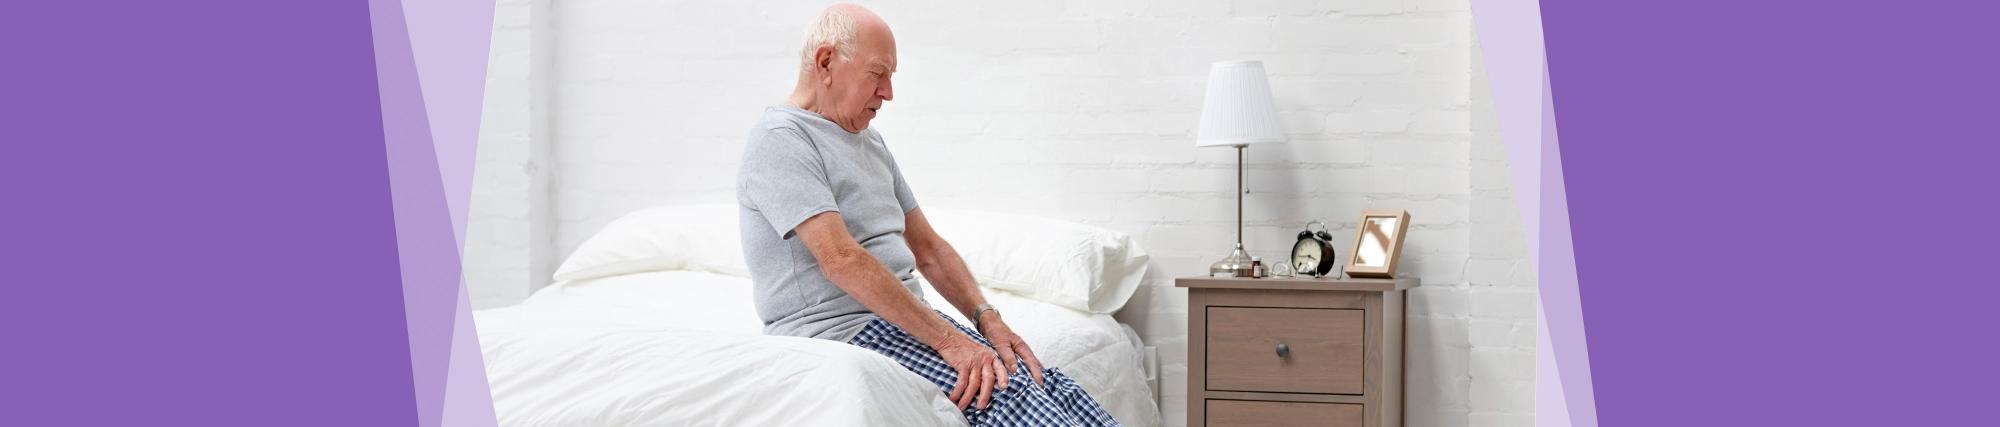 Douleur articulaire & arthrose